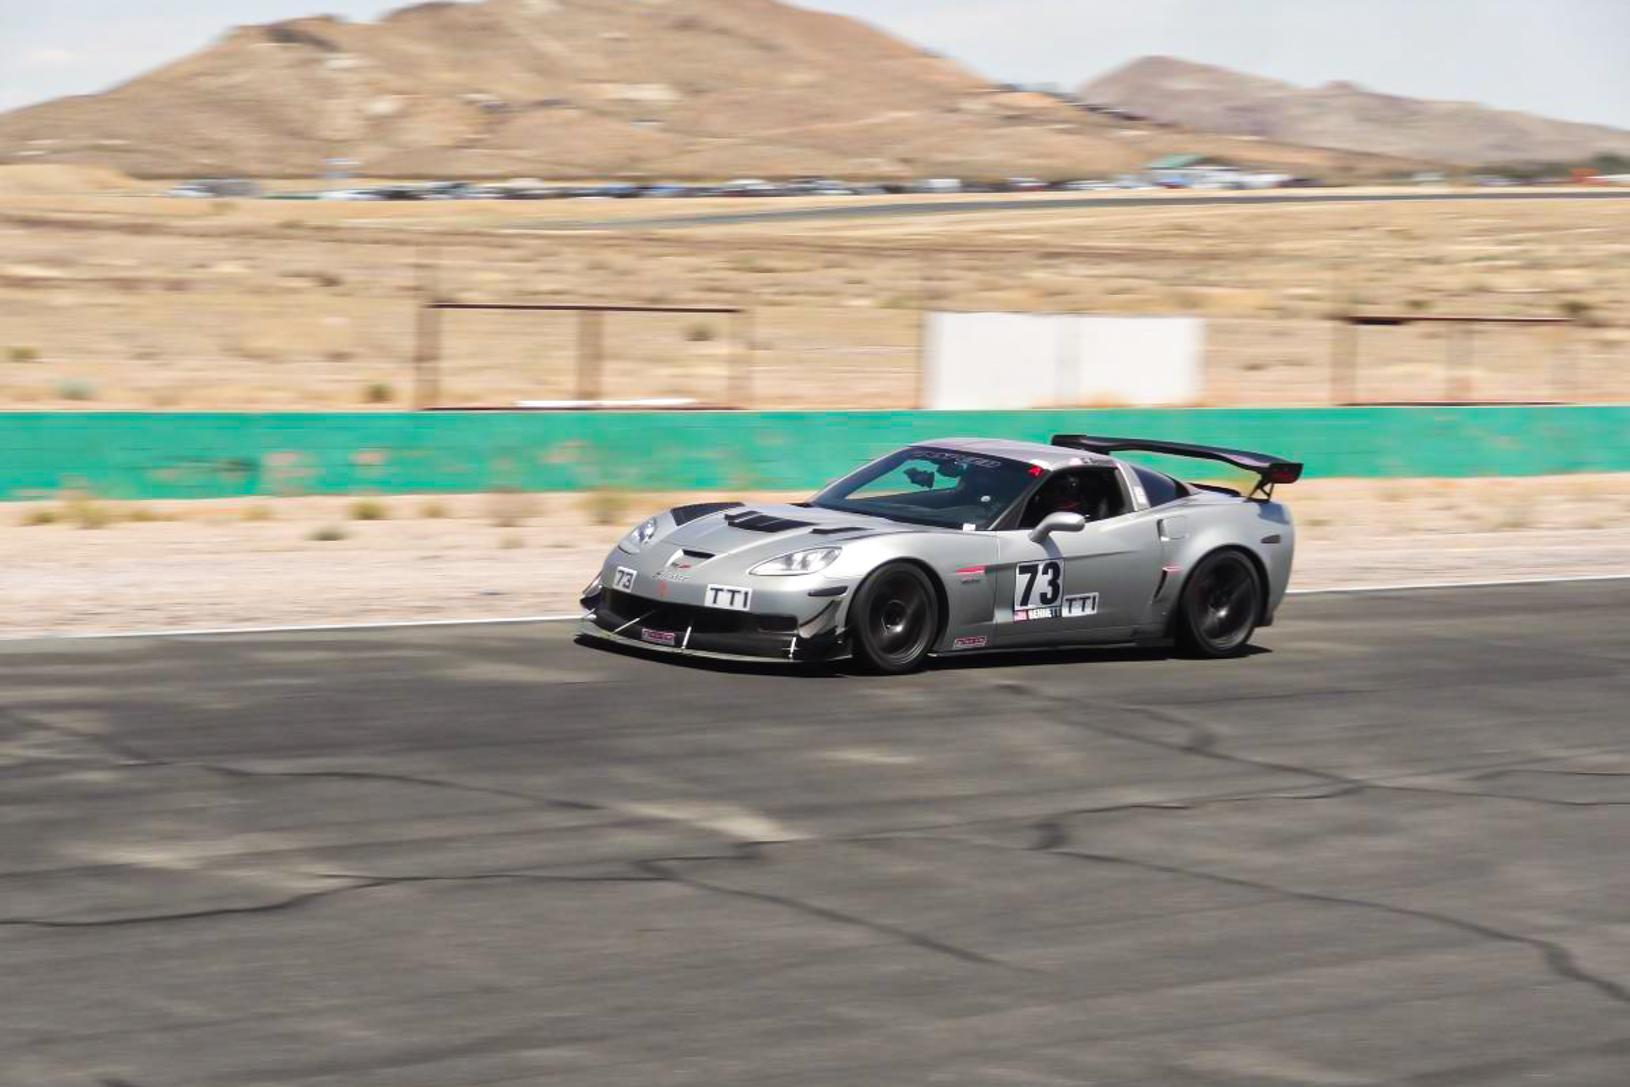 2007 Chevrolet Corvette Z06 'Track Car'